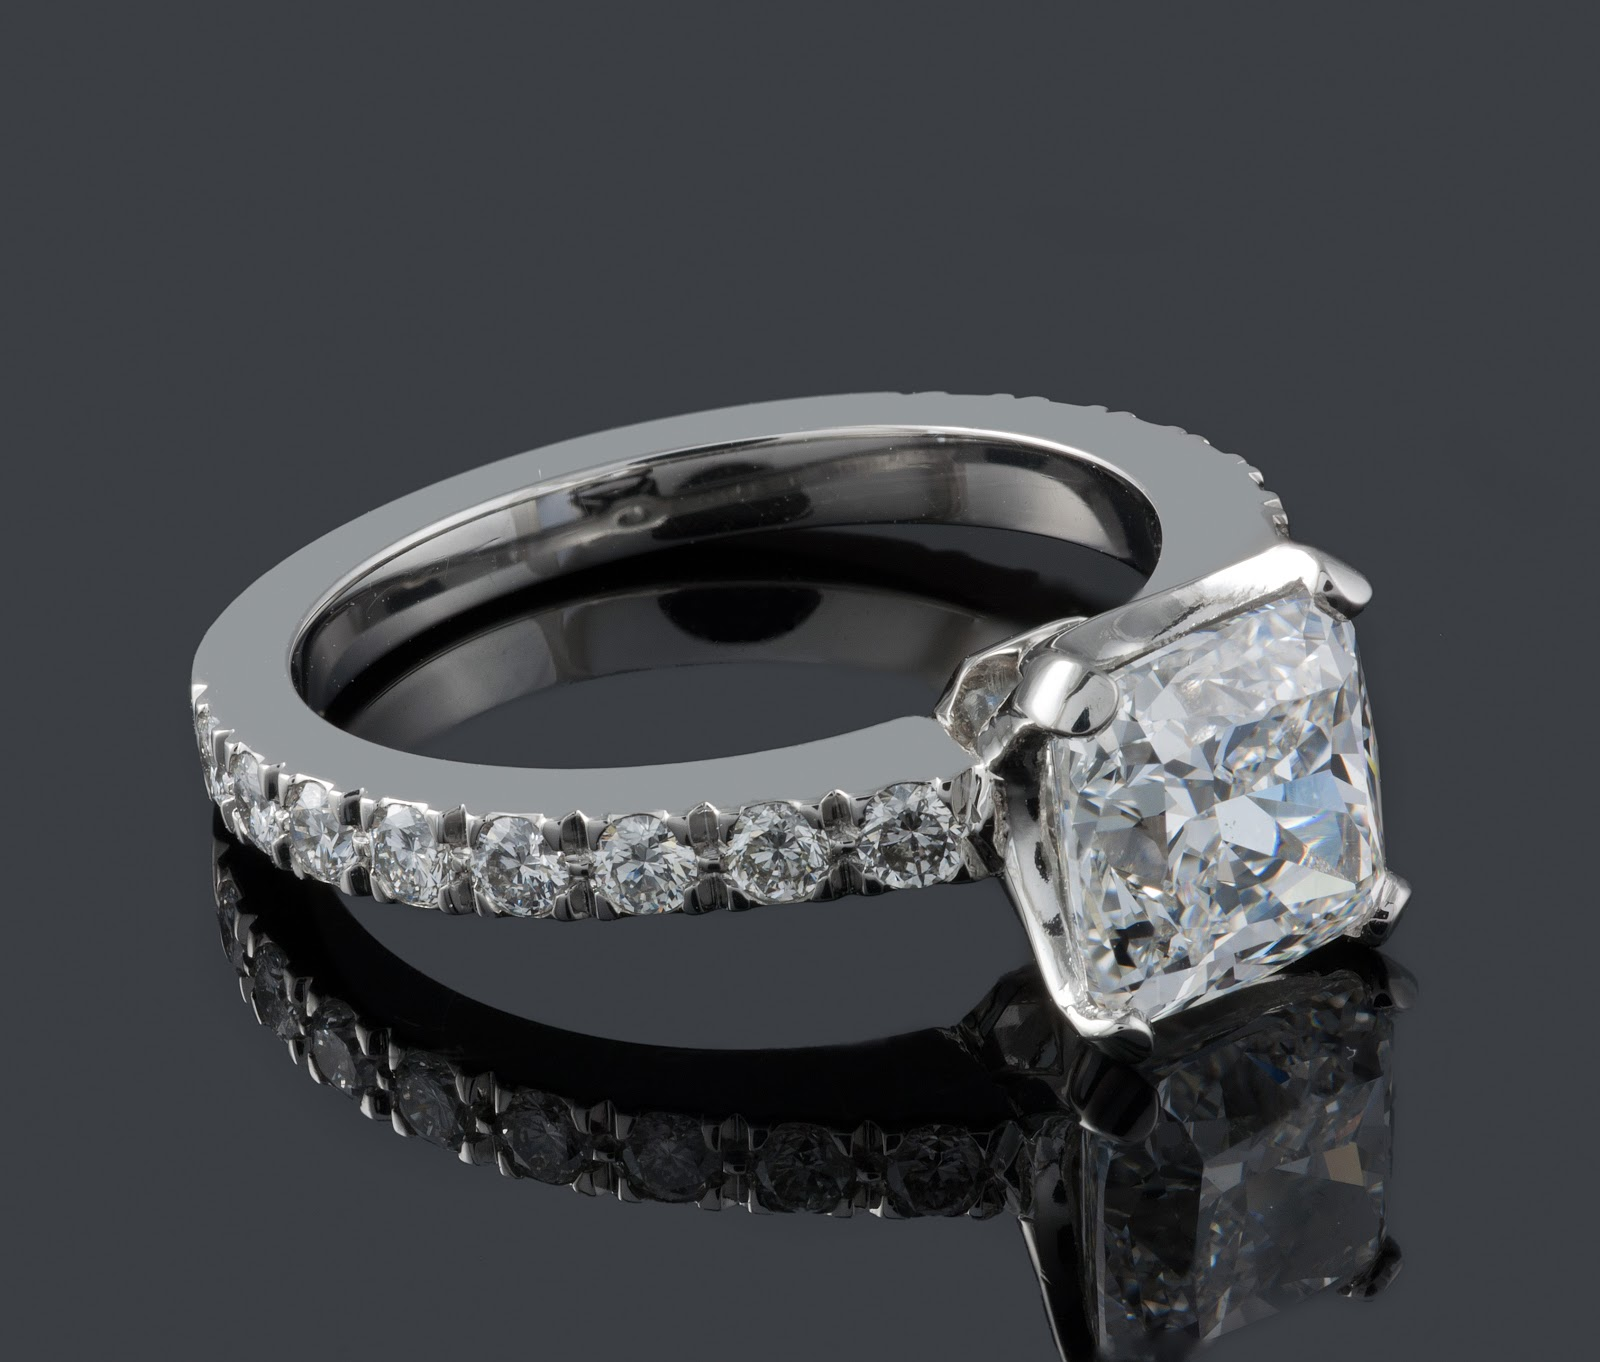 ffc4d6e357d9 1.20ct Cushion Cut Diamond set in Handmade Tiffany Novo Style Mount